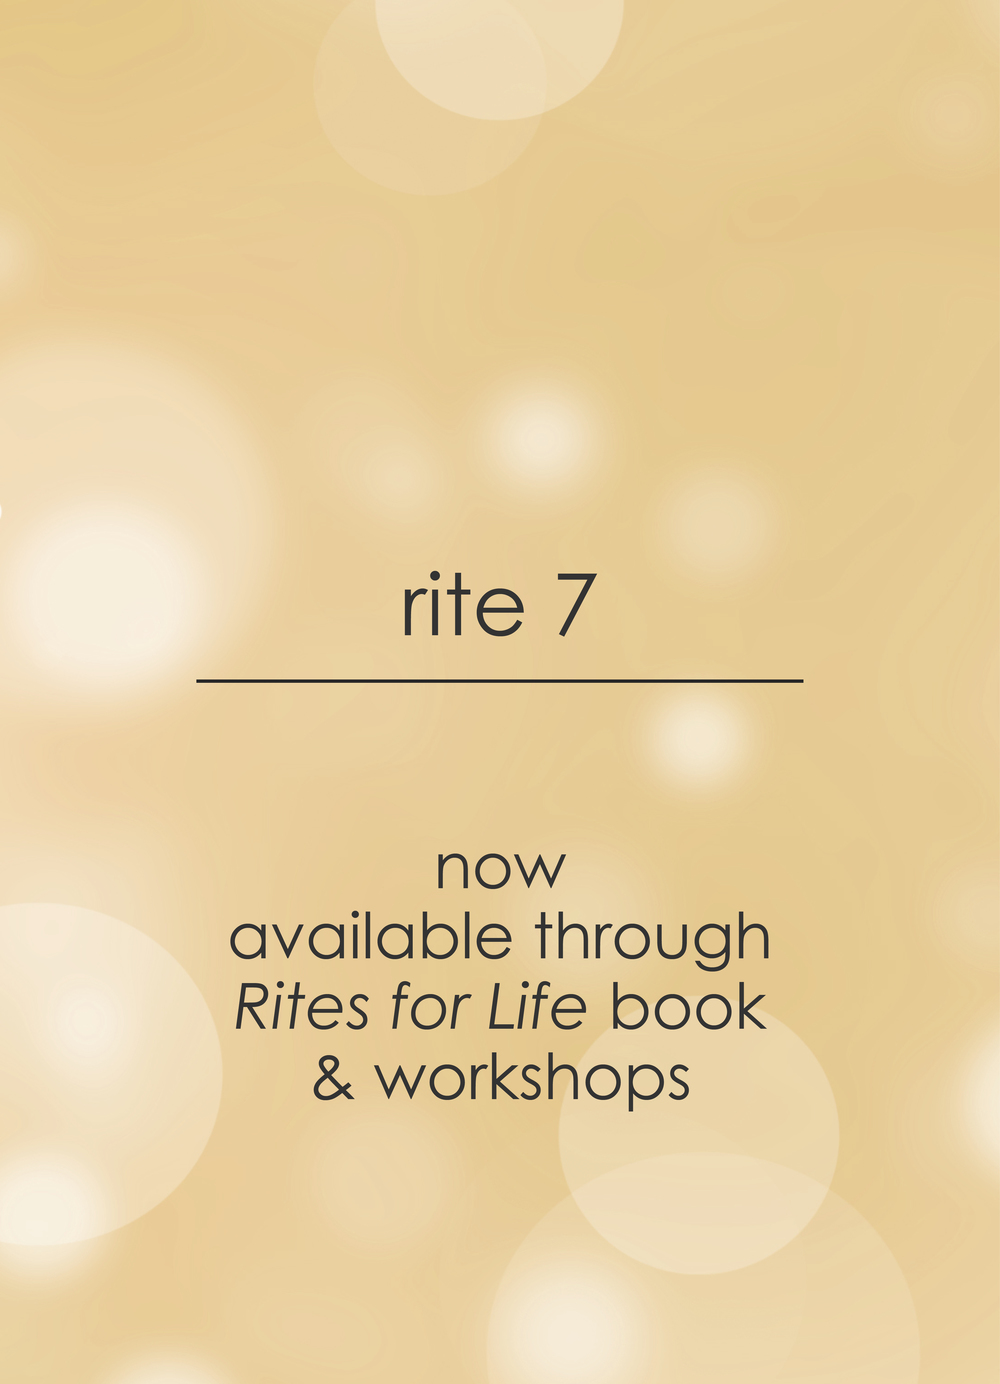 rites_for_life_yoga_rite_7d.jpg